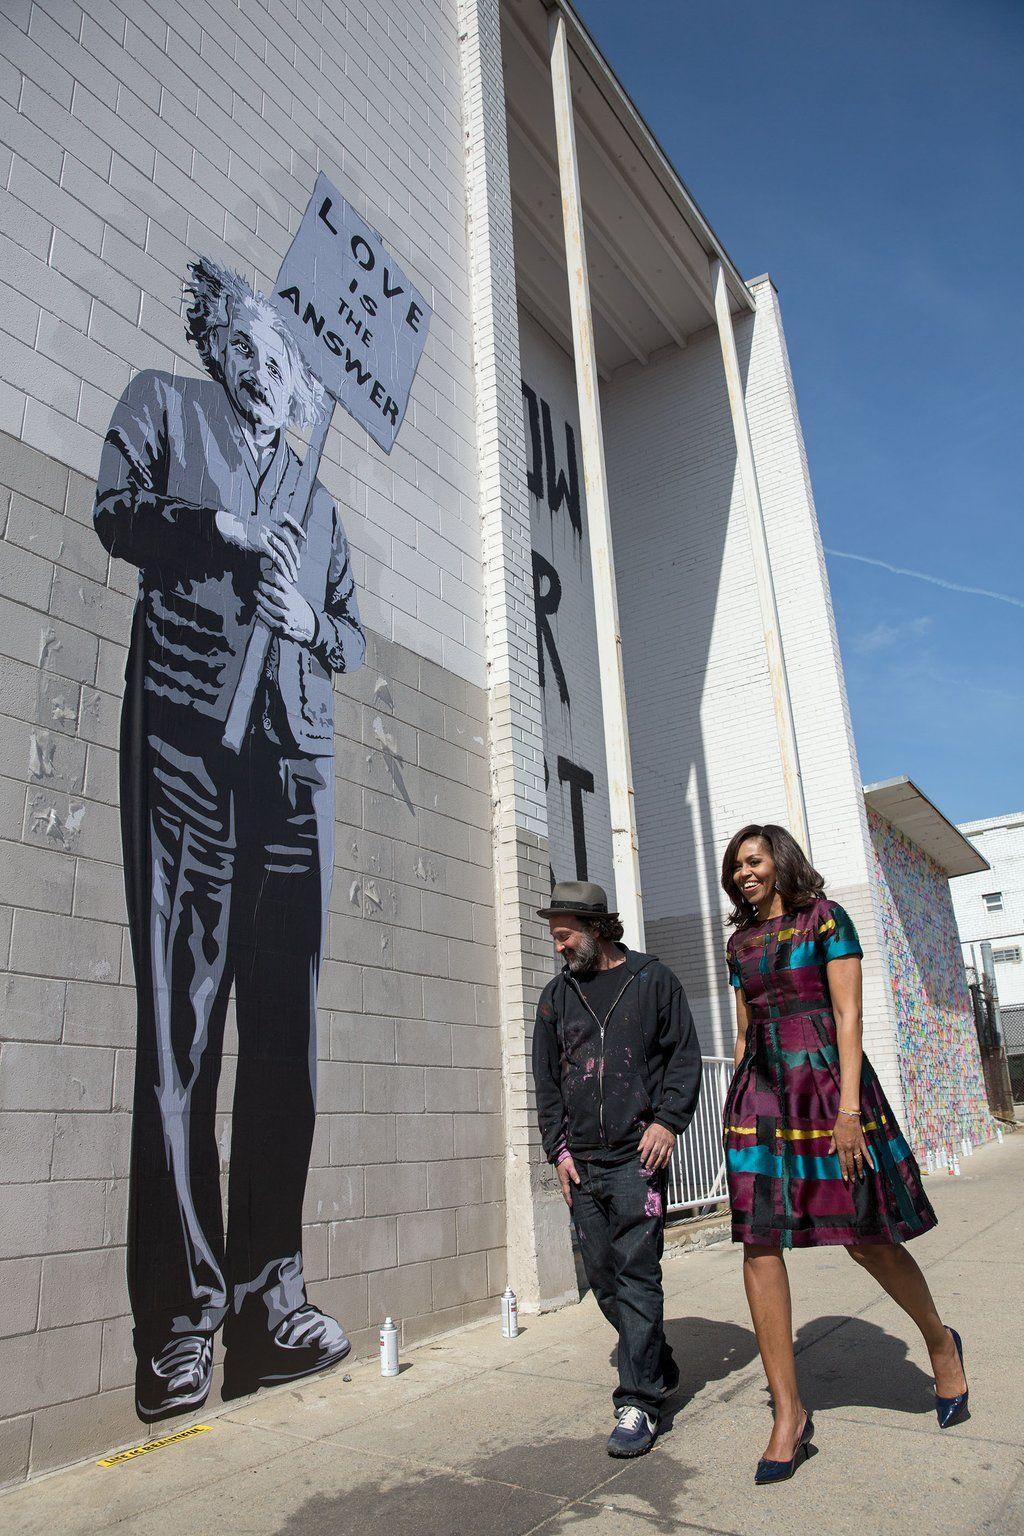 @AlbertEinstein : An oldie but goodie. Here's @FLOTUS and @MrBrainwash standing next to an Albert Einstein mural. http://bit.ly/1VZ0Pa2